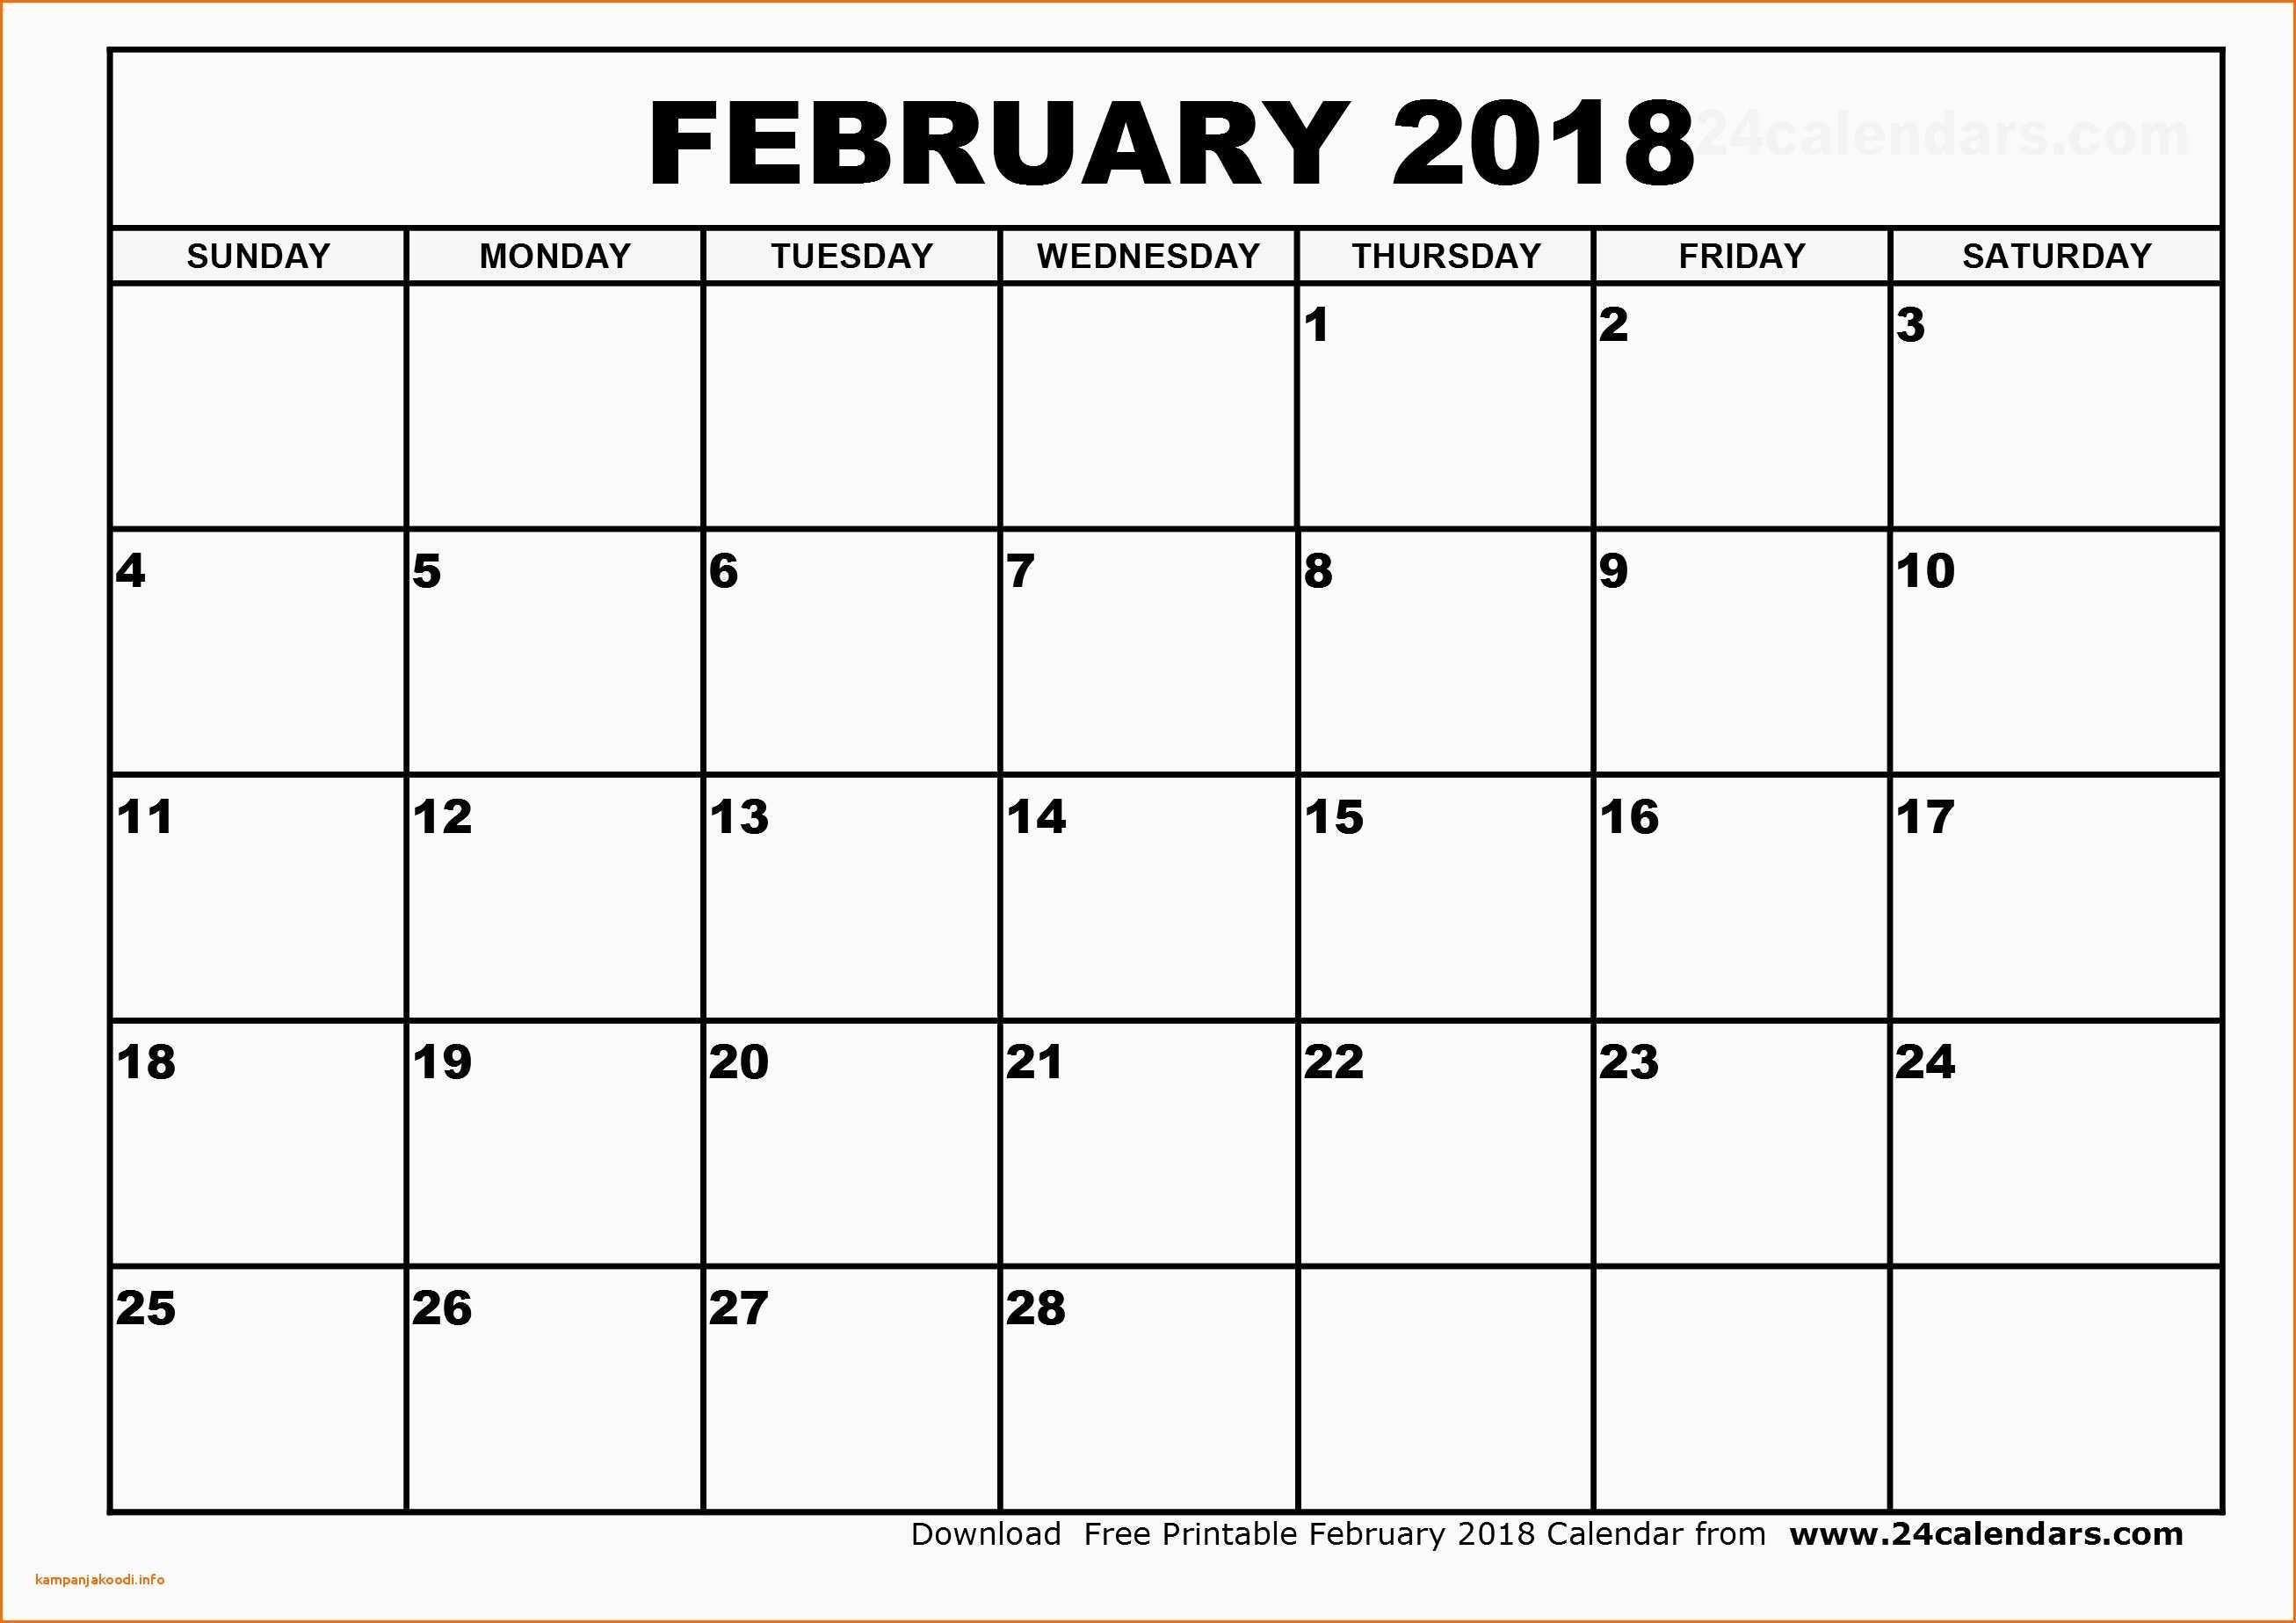 March Calendar 2018 Más Recientes Calendar Template to Print Luxury Chore Chart Unique Chore Calendar Of March Calendar 2018 Recientes Calendar 2019 March Graph Template for Kids Fresh Graphs